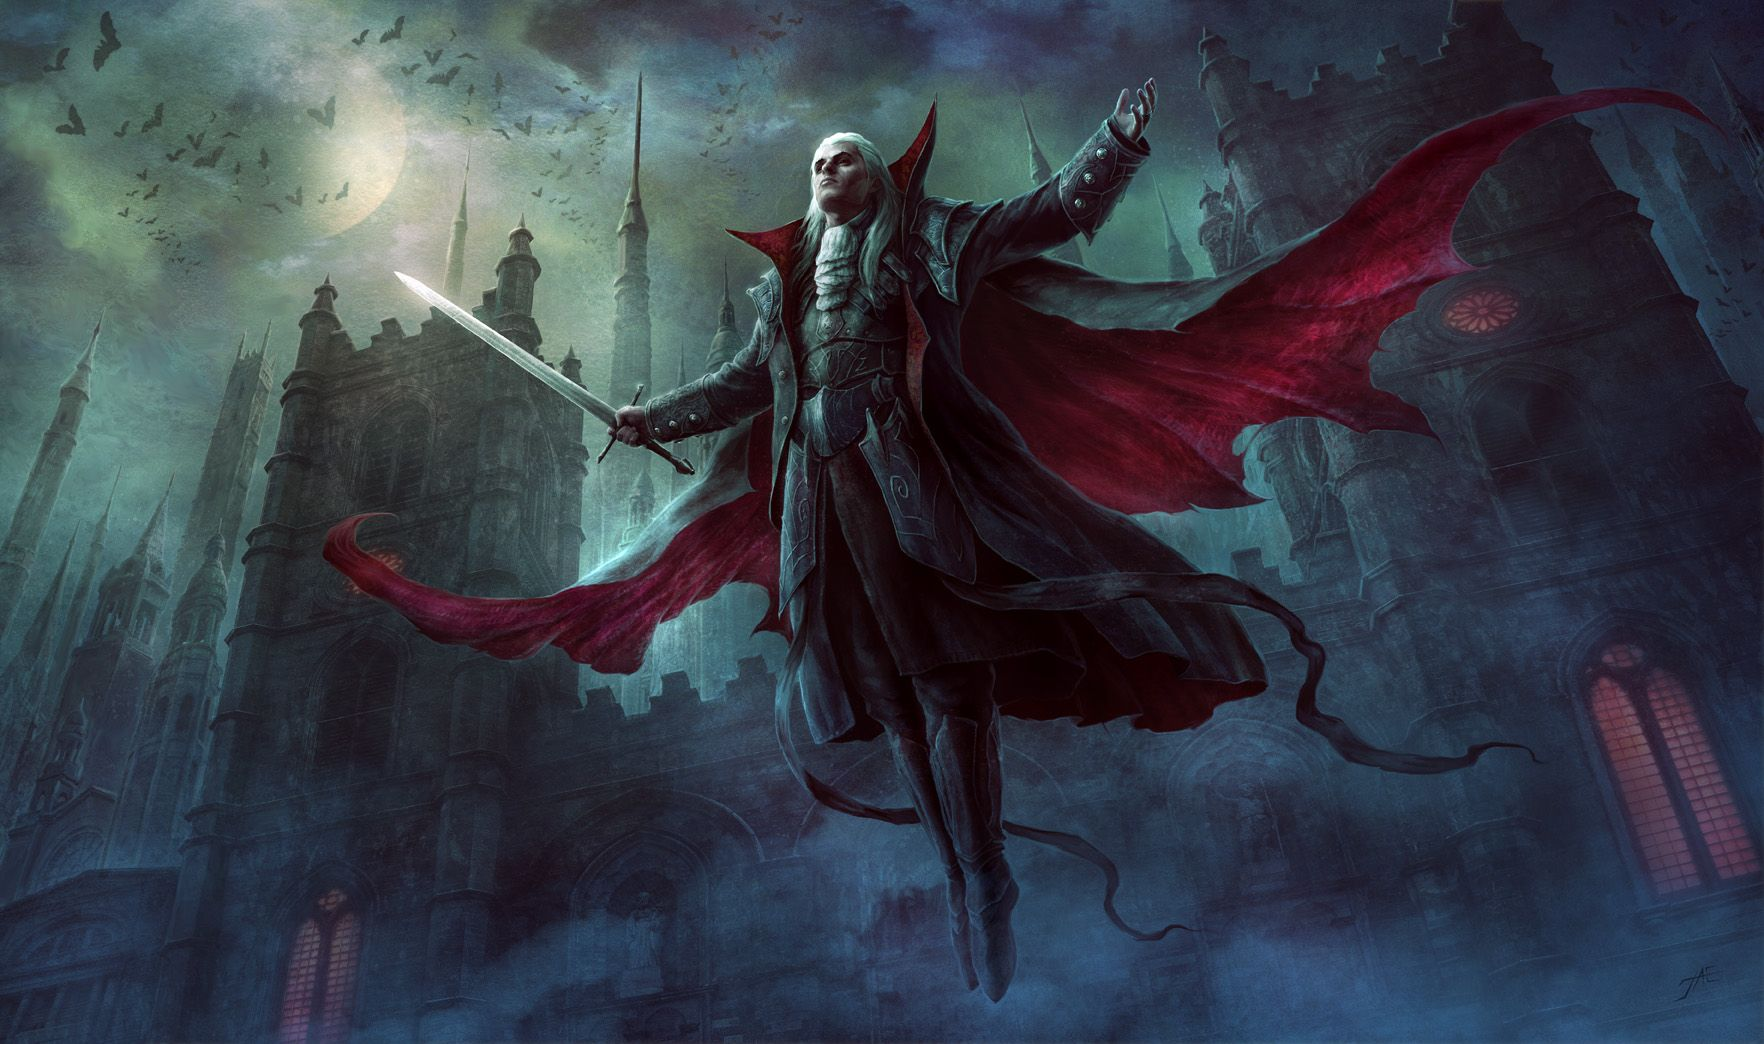 City of aThousand Steeples | Vampire art, Fantasy artwork, Art